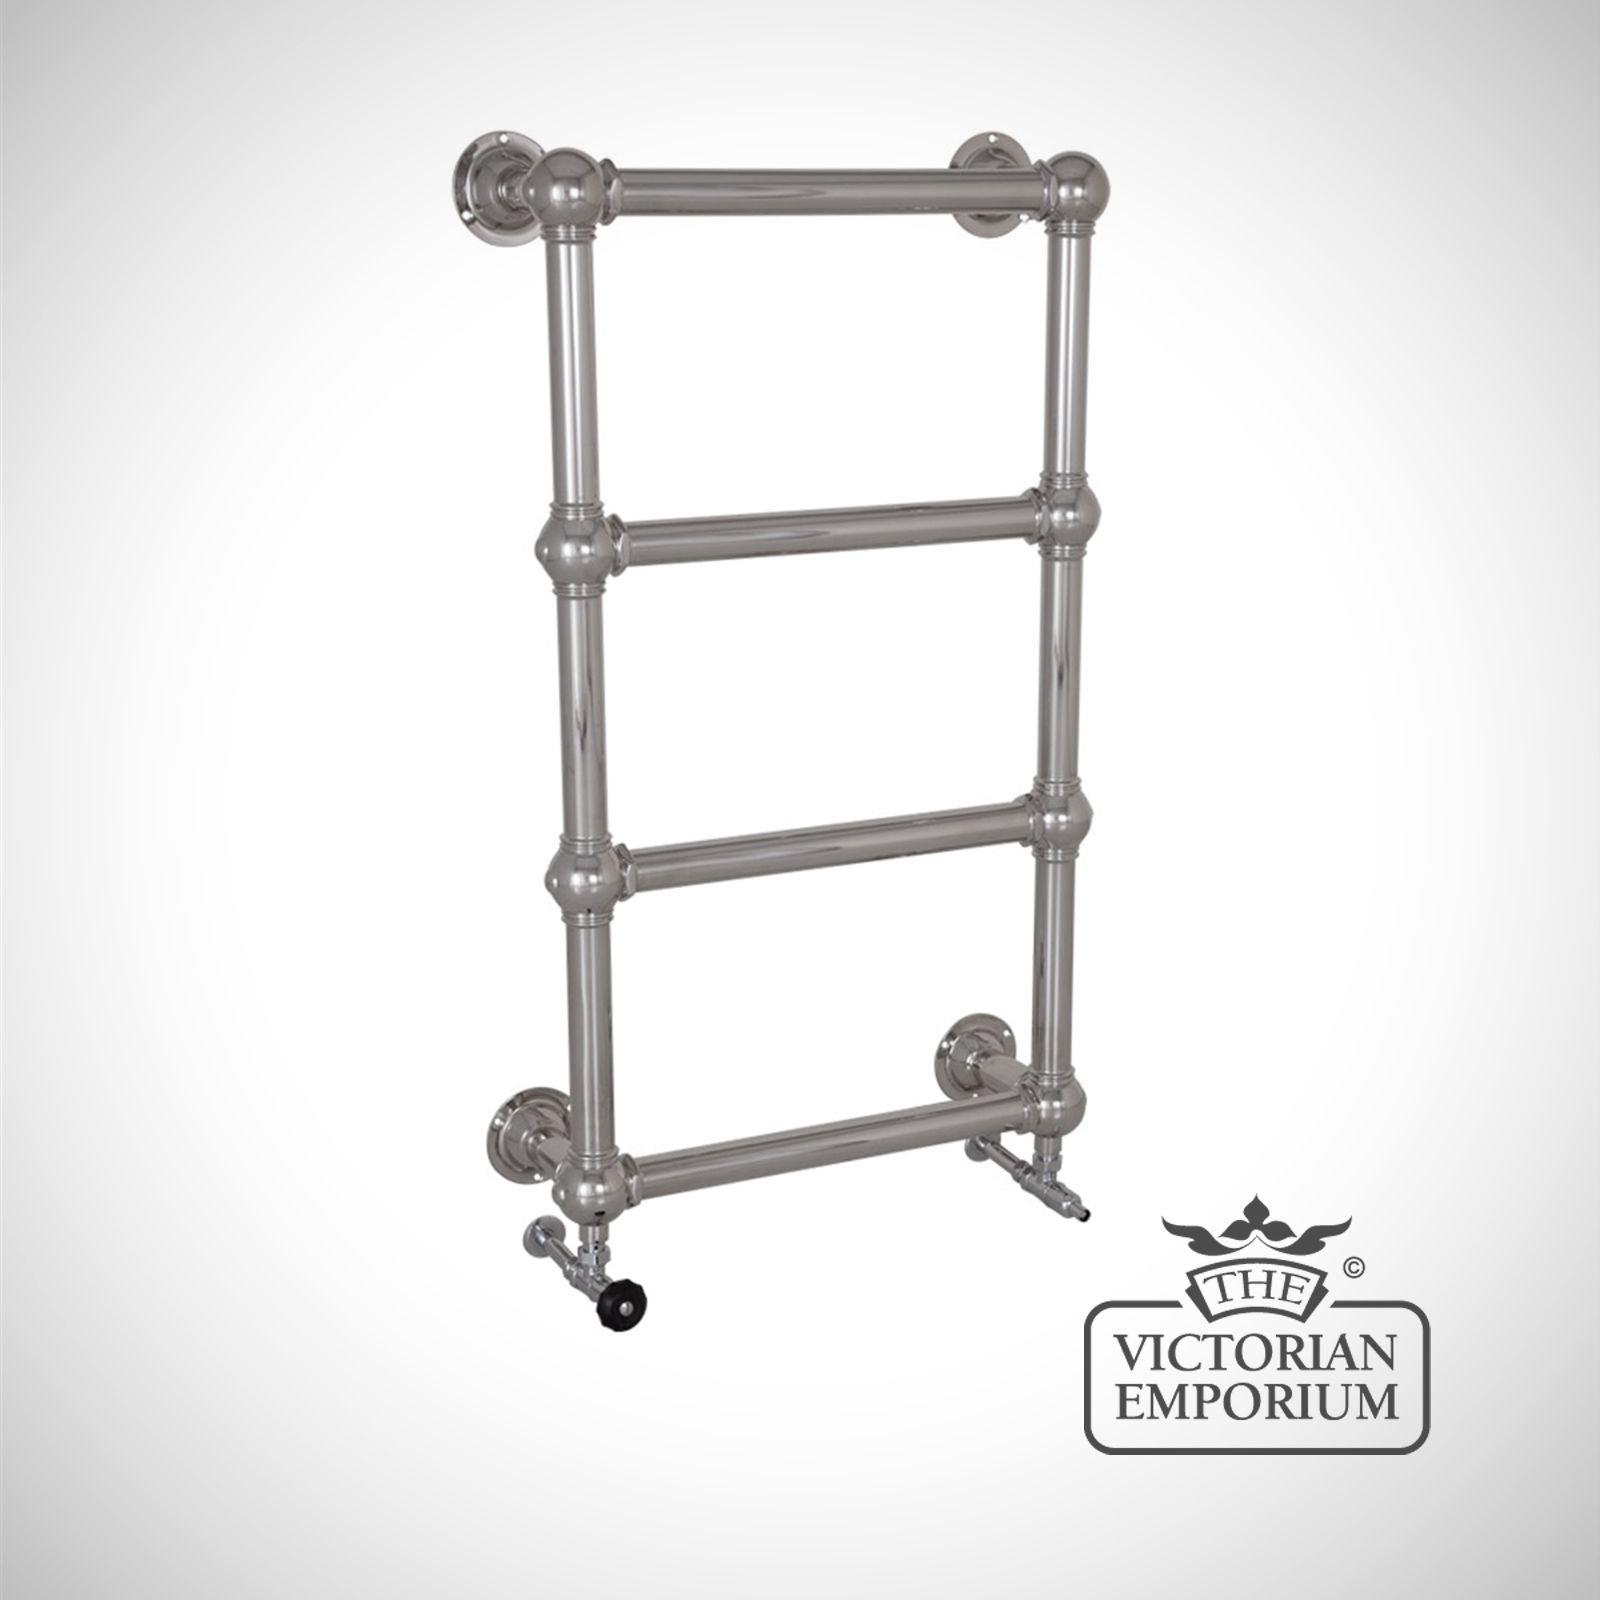 Carron Colossus Horse Steel Towel Rail For Sale: Grande Heated Towel Rail 1000x600mm